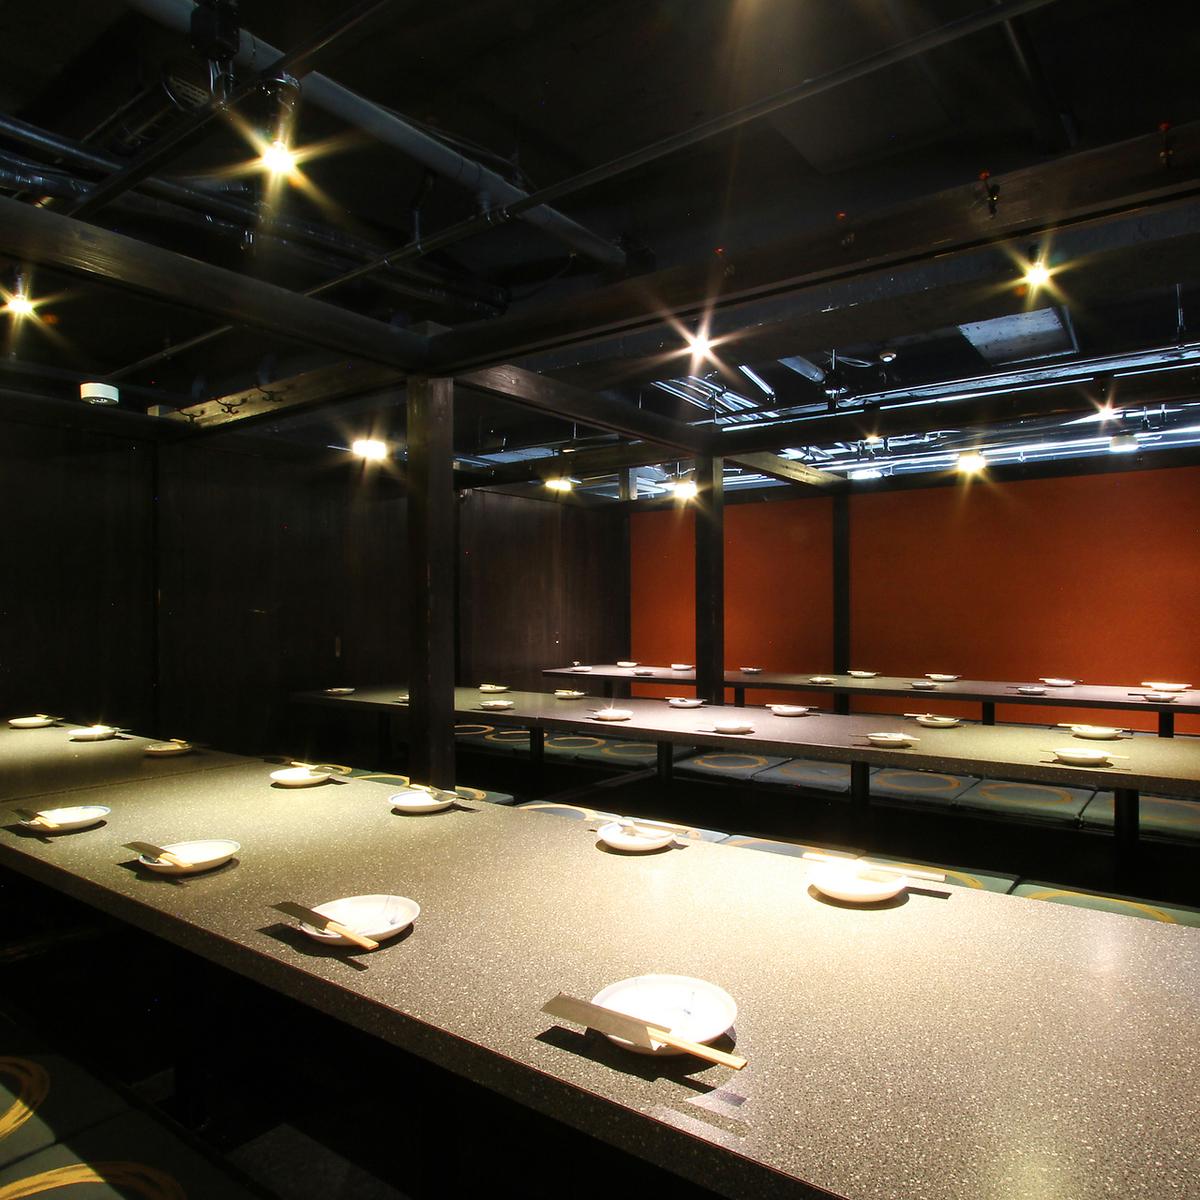 Keikyu Kawasaki Station Central Chuo步行30分钟☆JR川崎站步行1分钟★【Daiichi Keihin Building 5F Lol-sman Jonathan和同一栋楼】